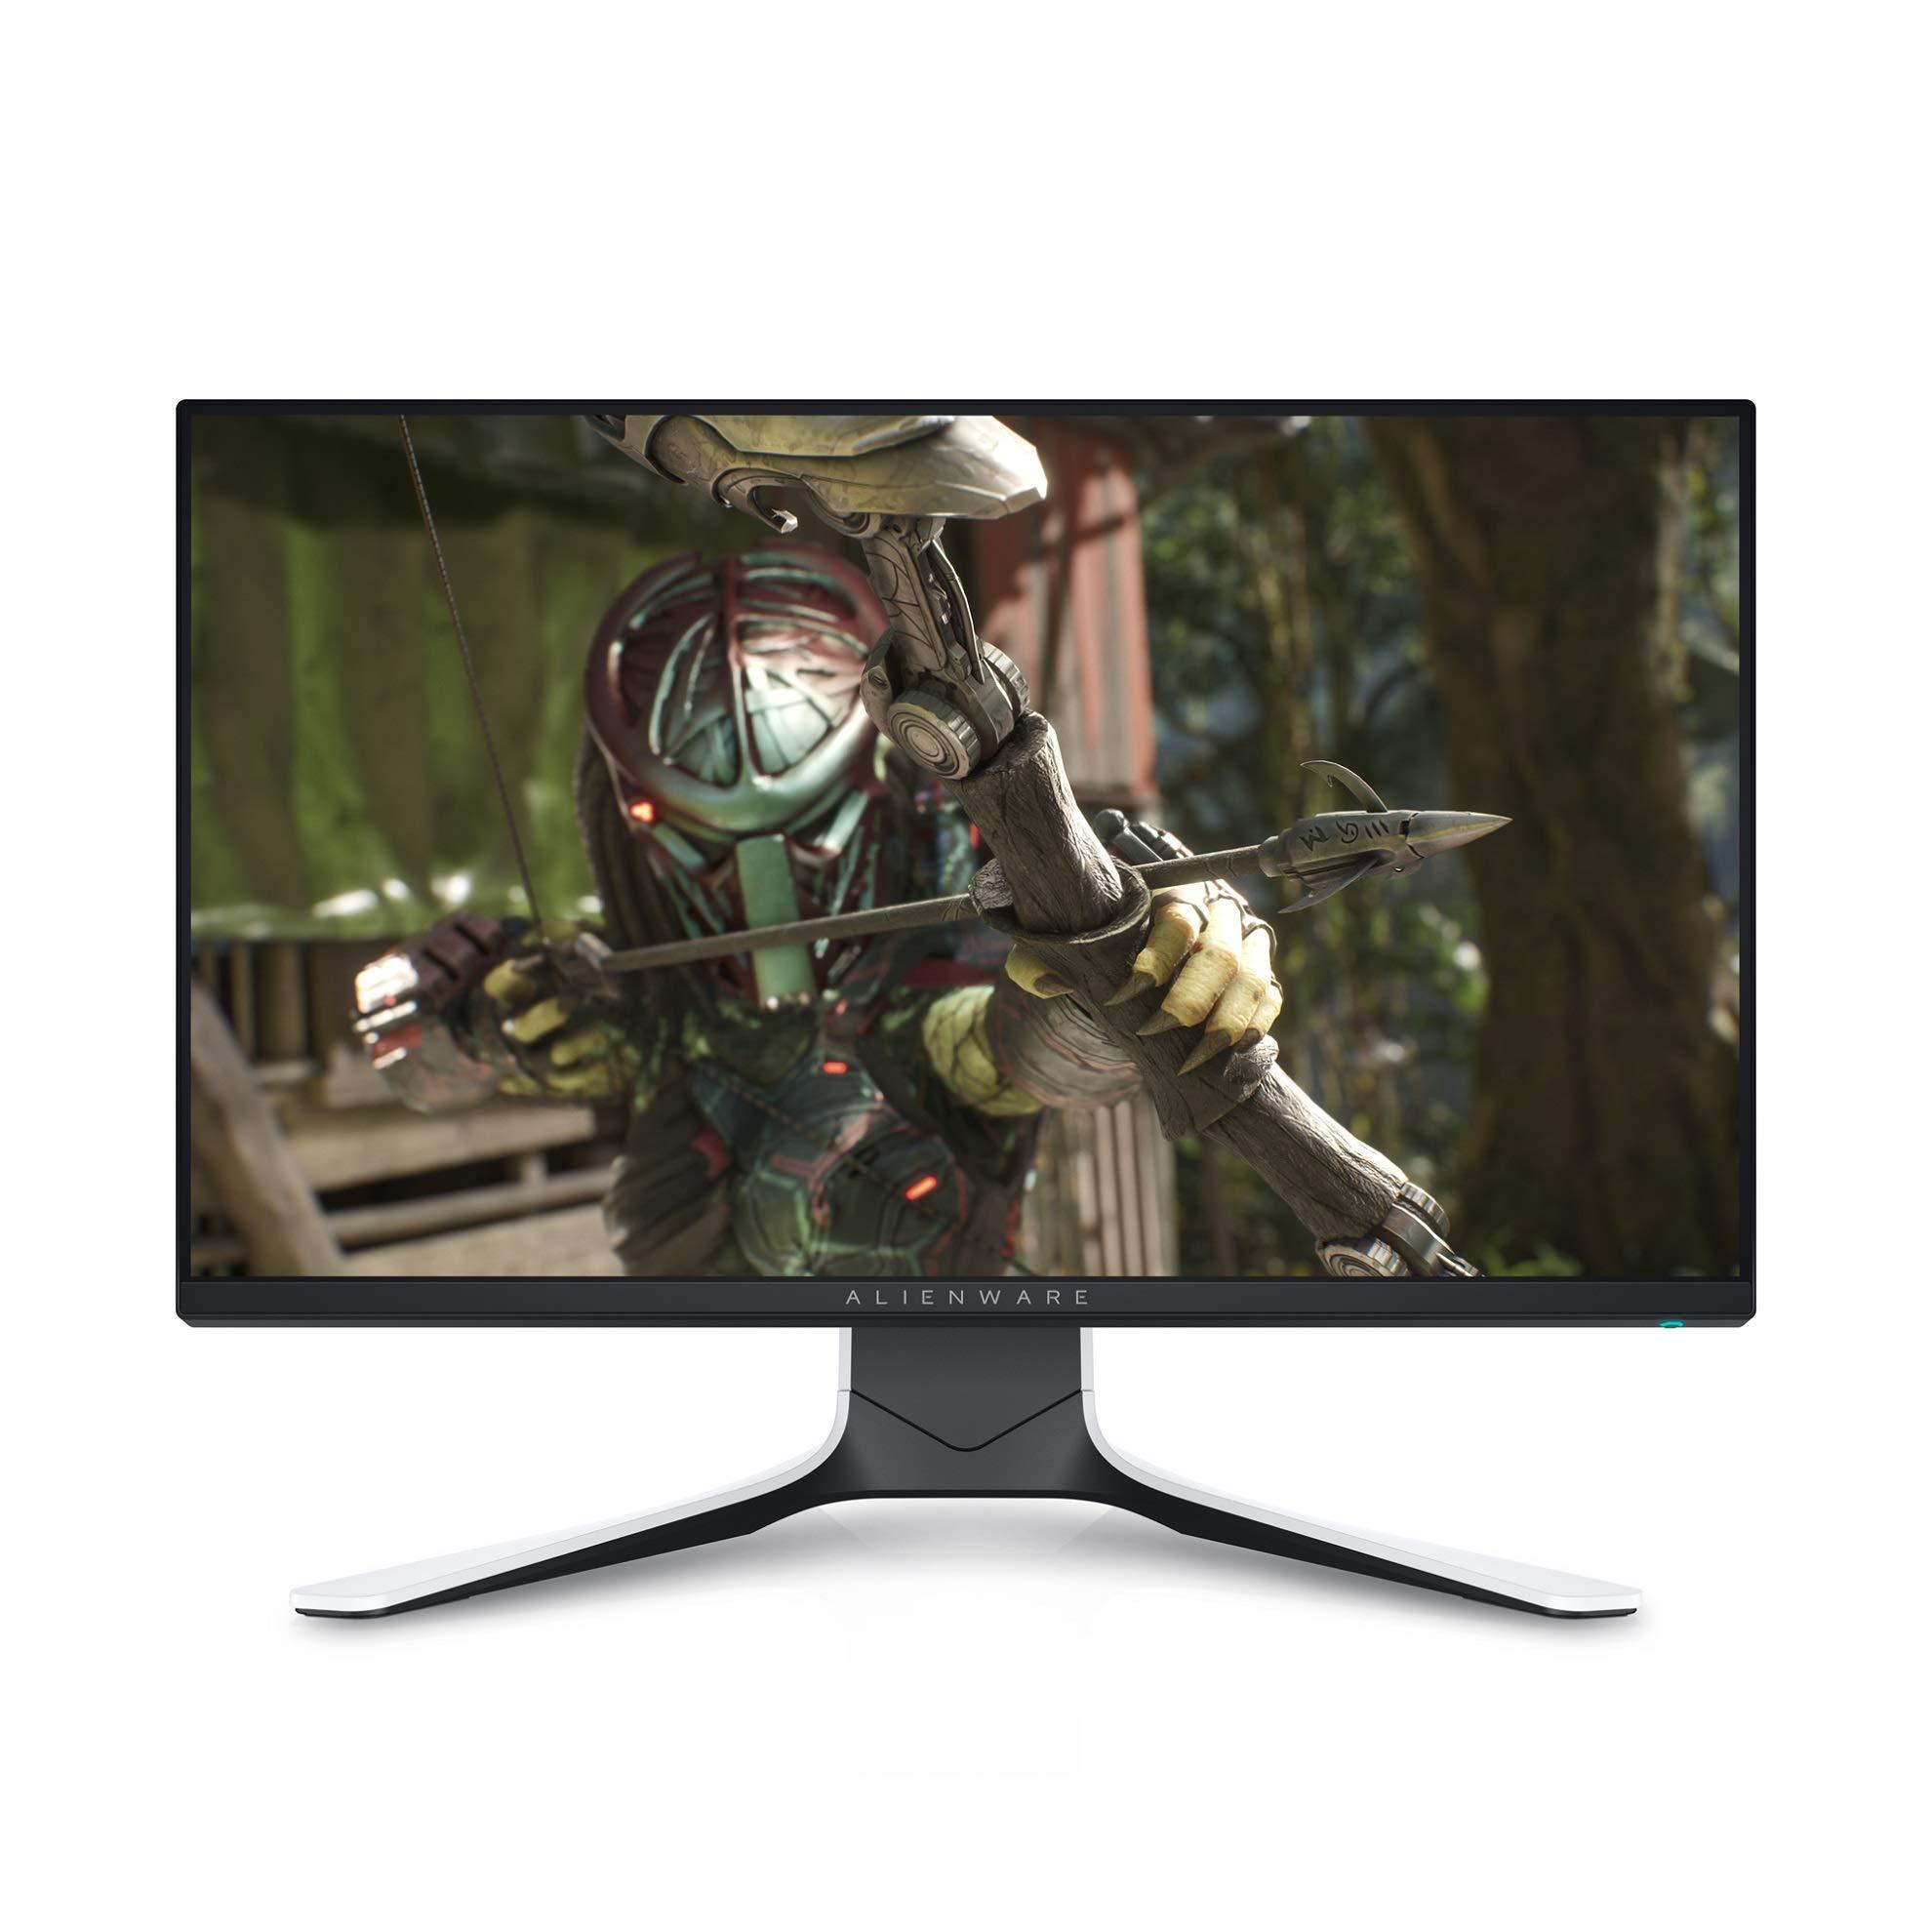 DELL Alienware AW2521HFL - Monitor LED para Juegos (63,5 cm (25